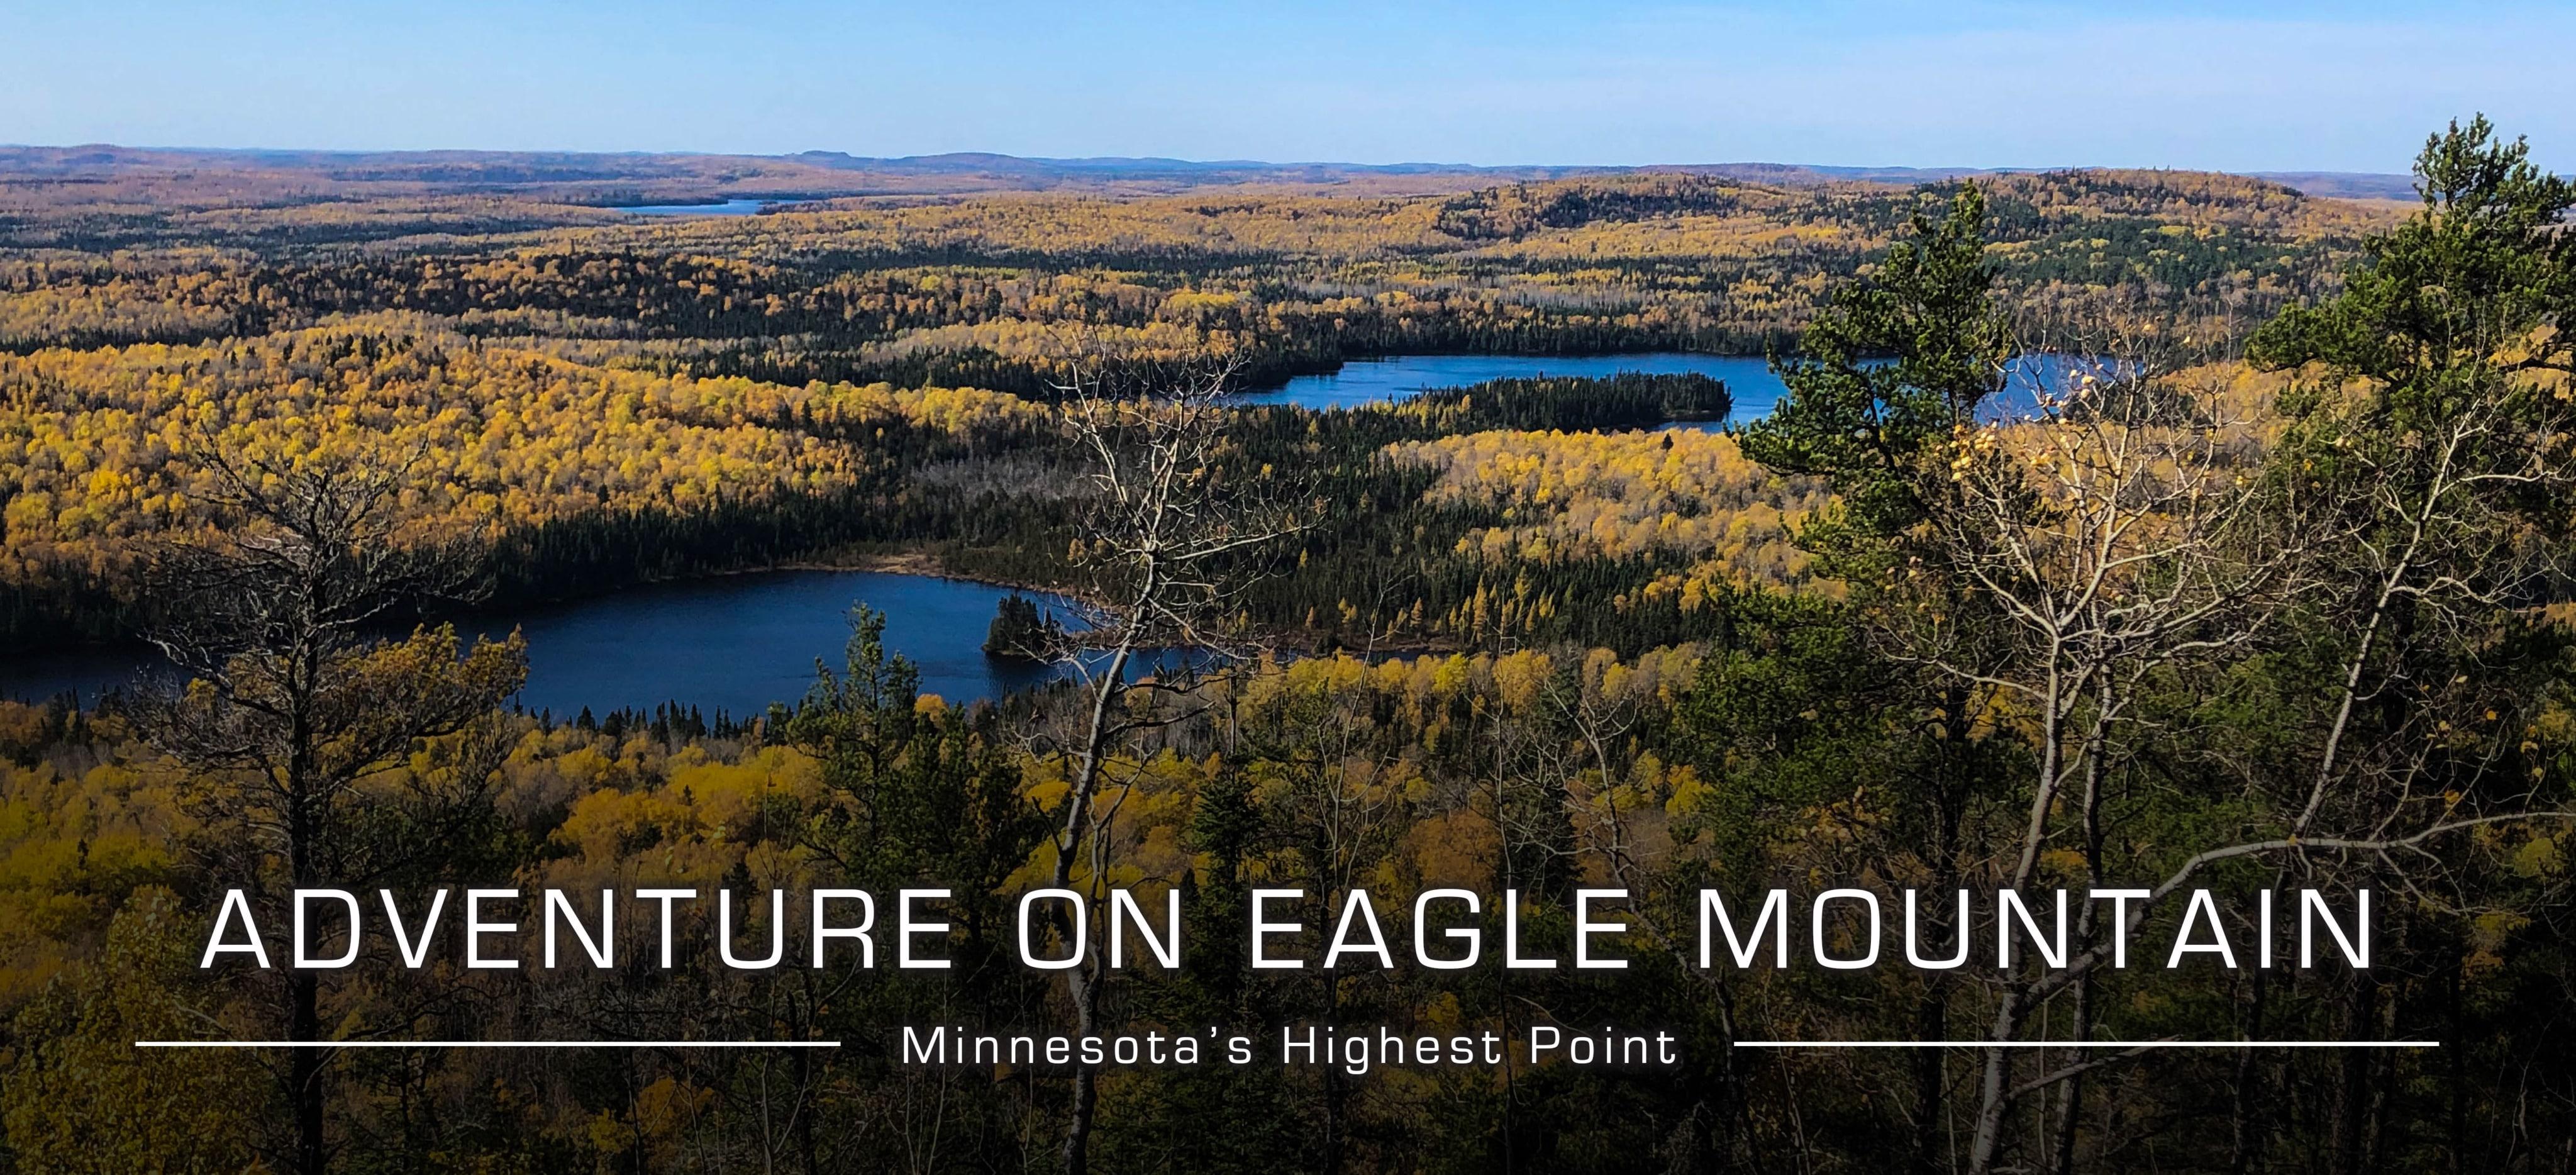 Eagle Mountain Adventure Hike in Minnesota (MN)